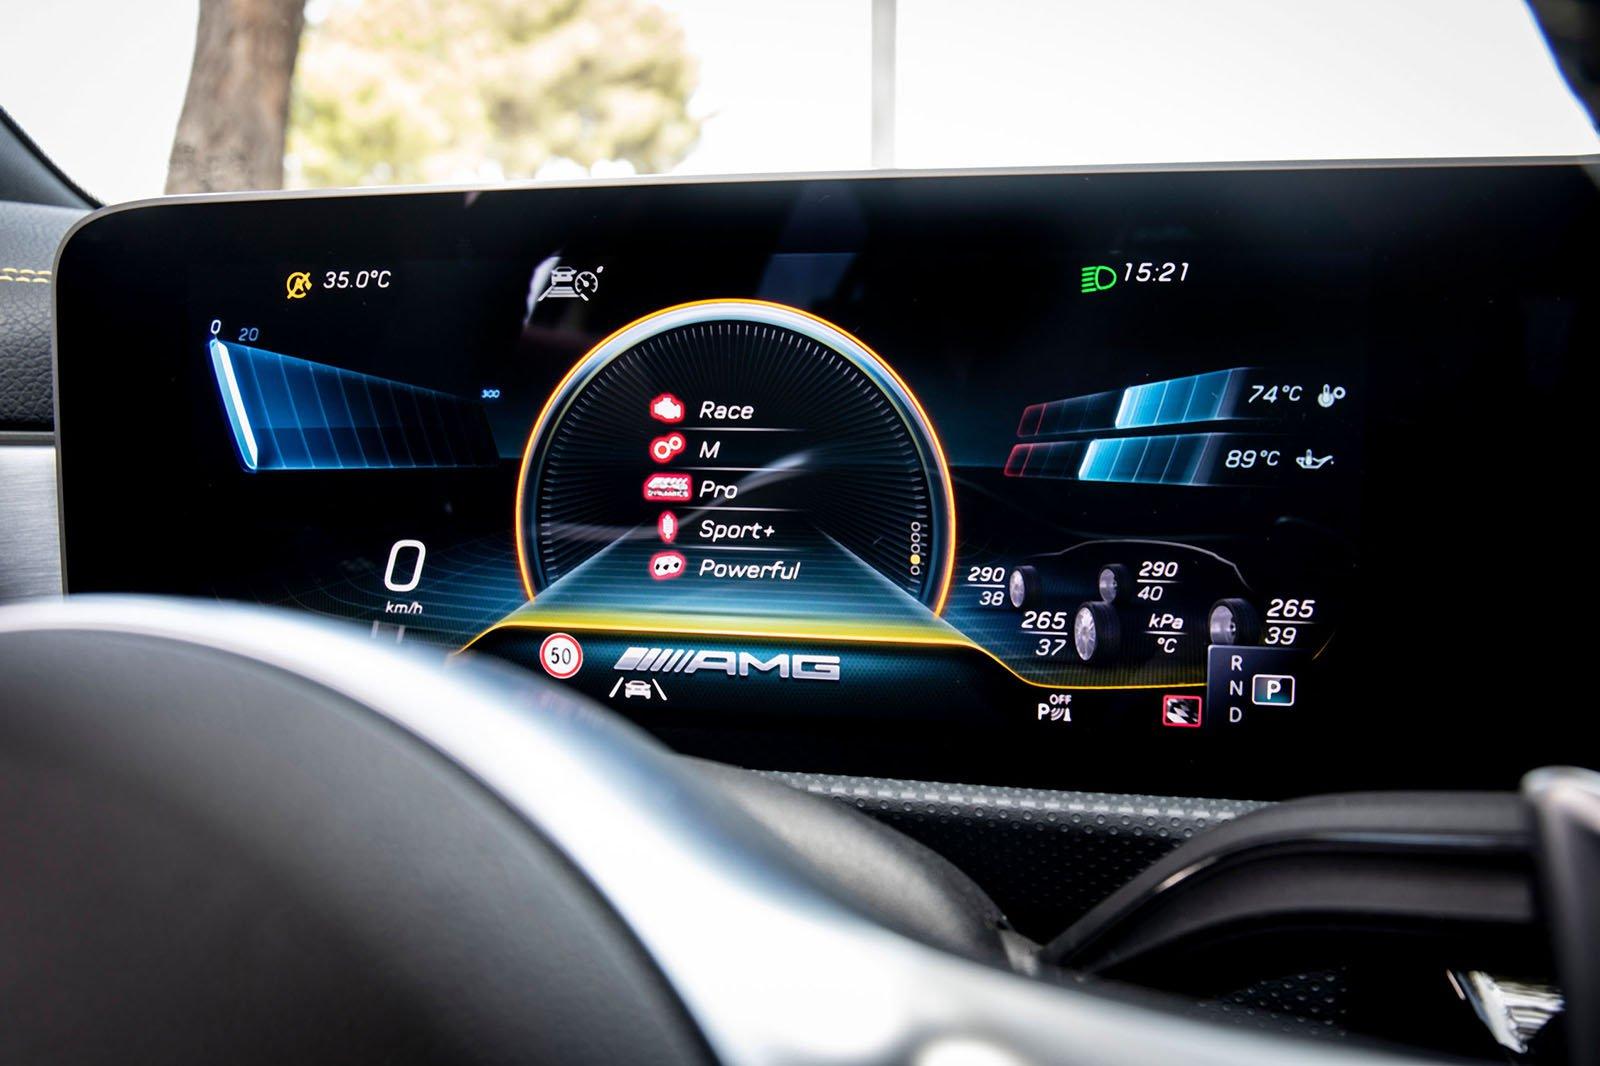 Mercedes-AMG CLA 45 S 2019 dashboard closeup